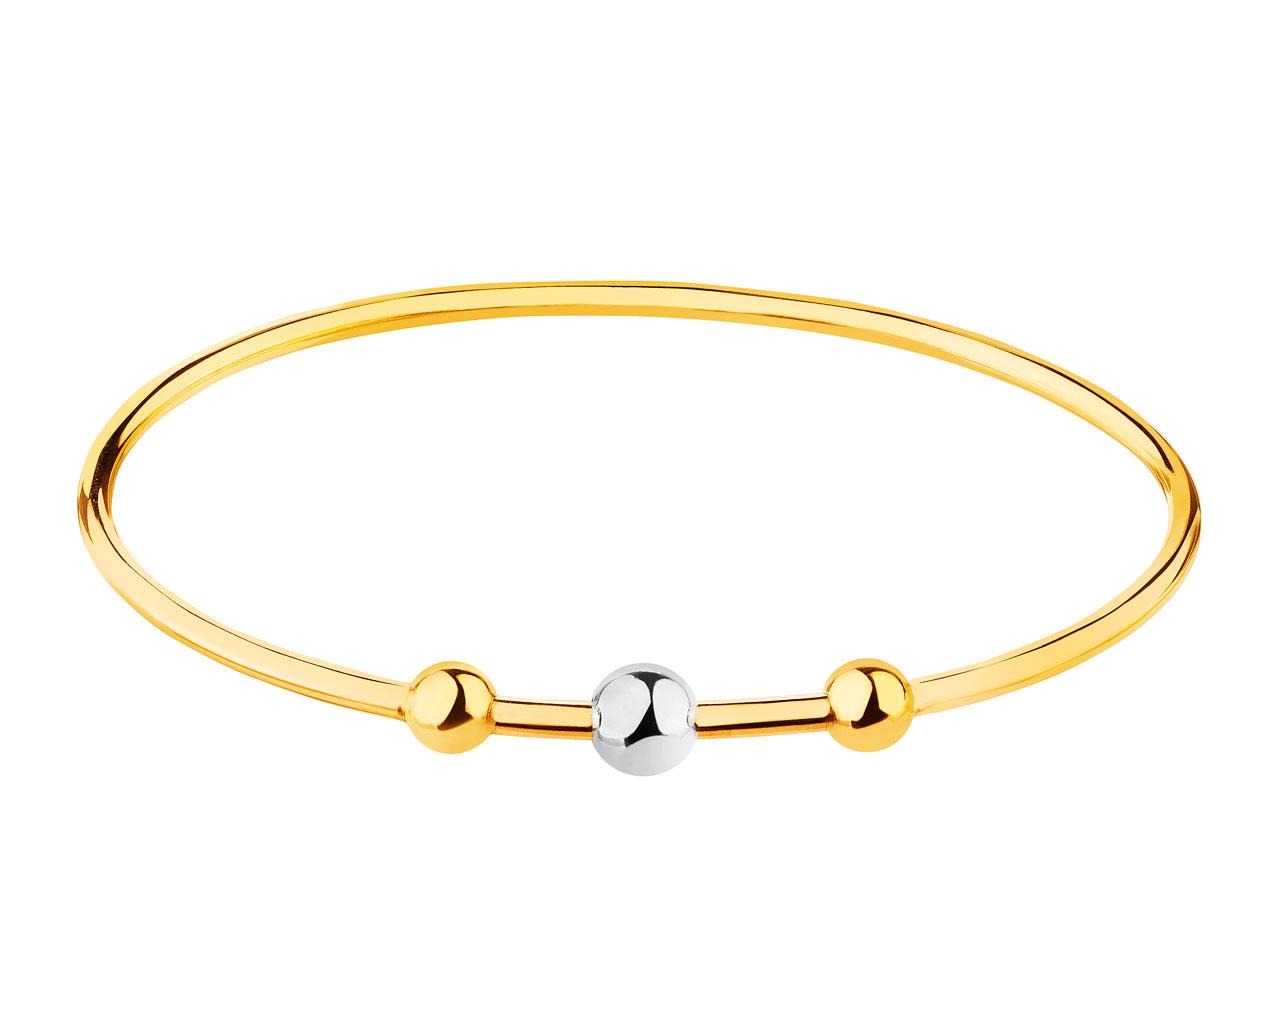 14ct Yellow Gold, White Gold Bracelet